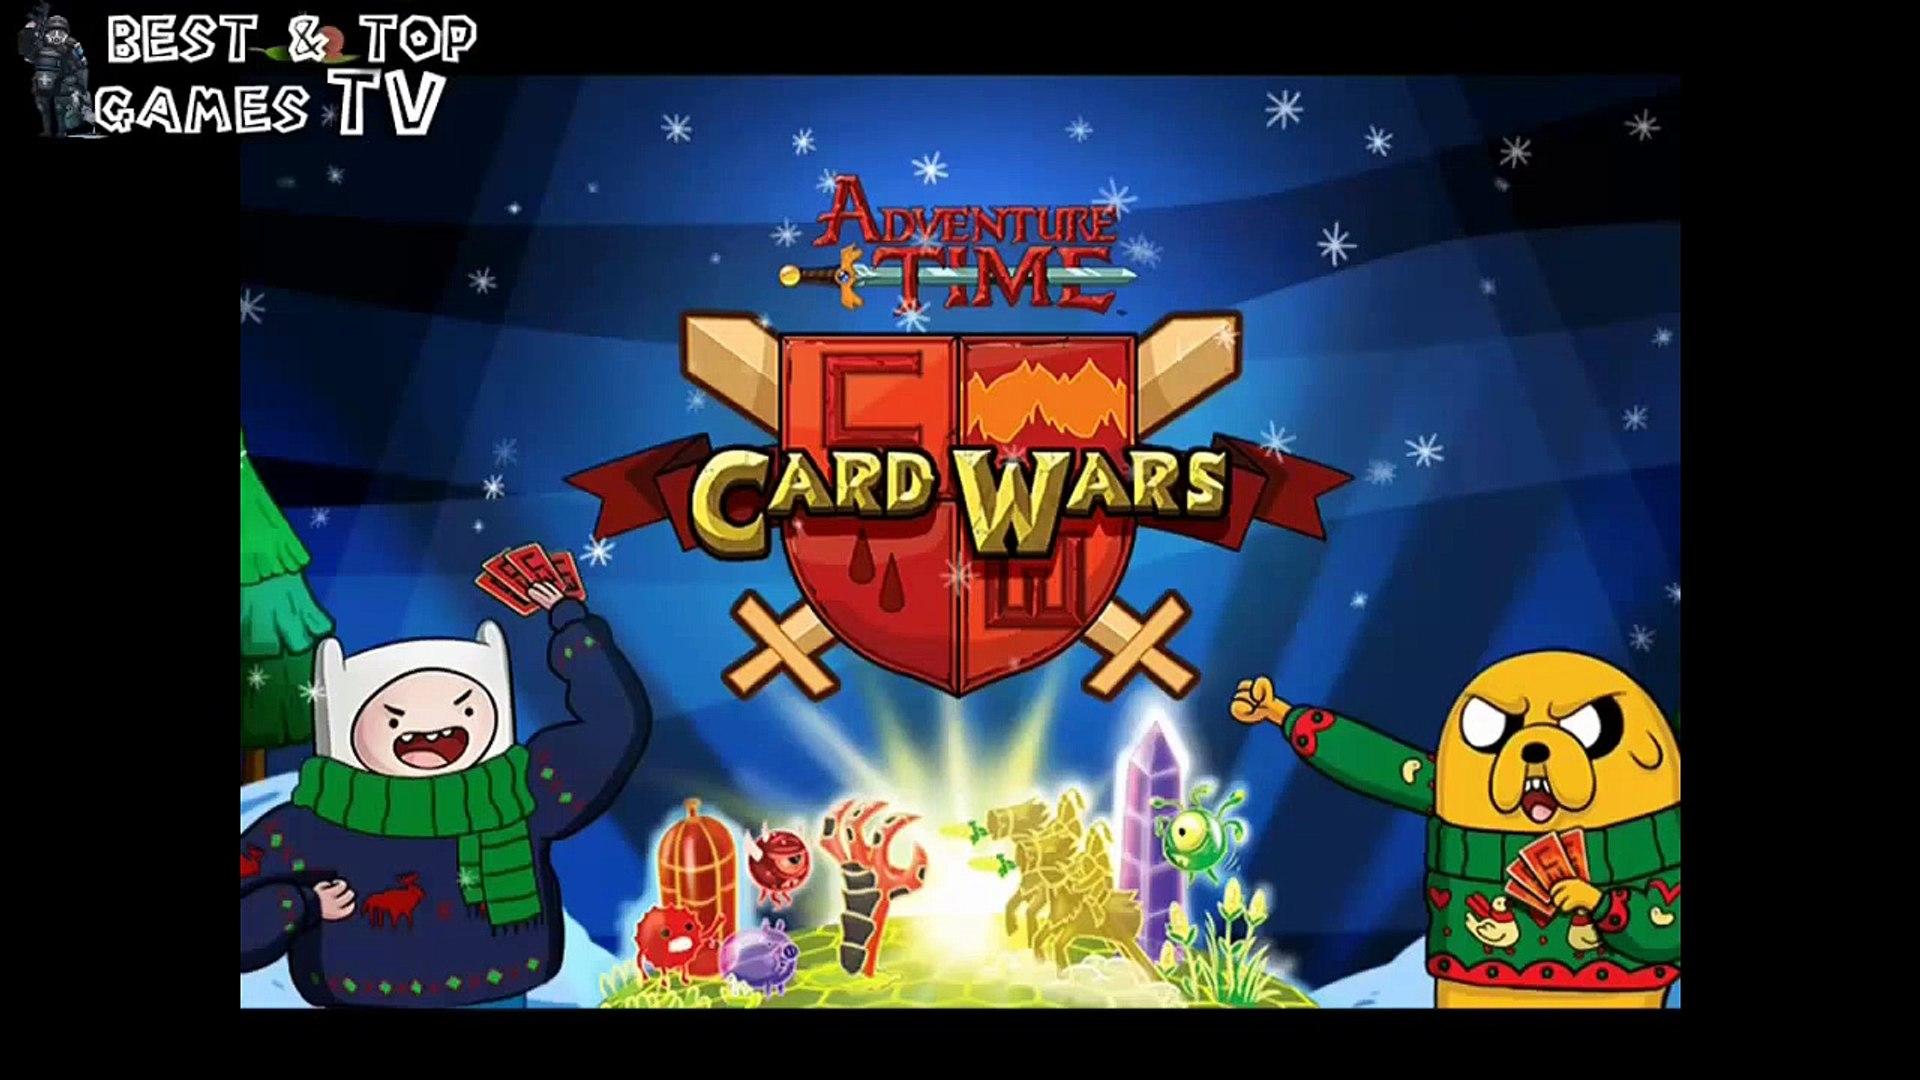 Card Wars   Android iOS GamePlay Cartoon Network Games | cartoon network games